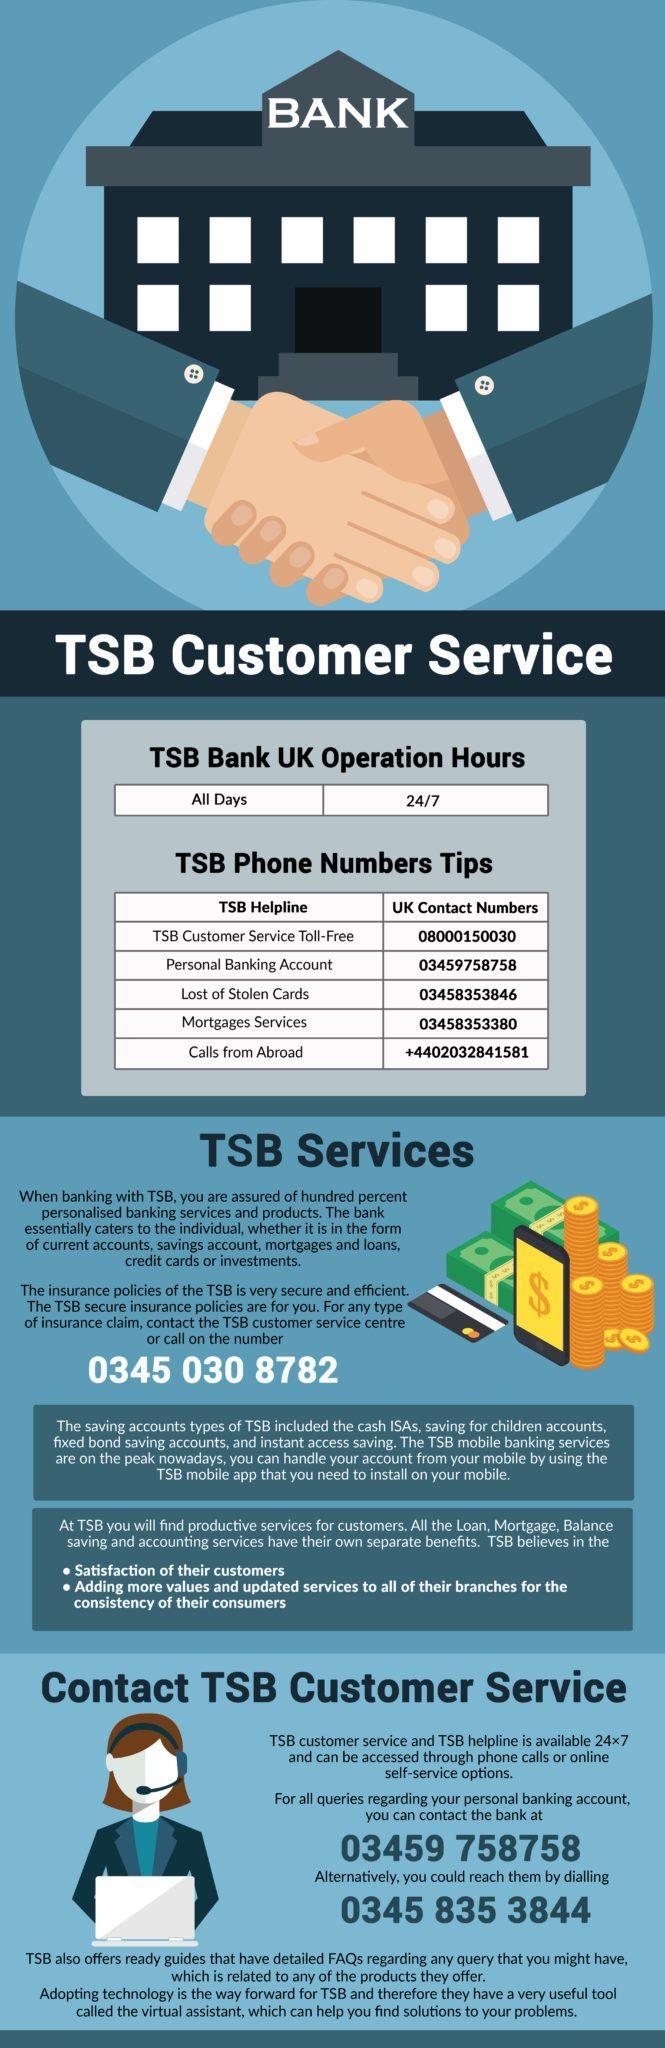 TSB Customer Service number